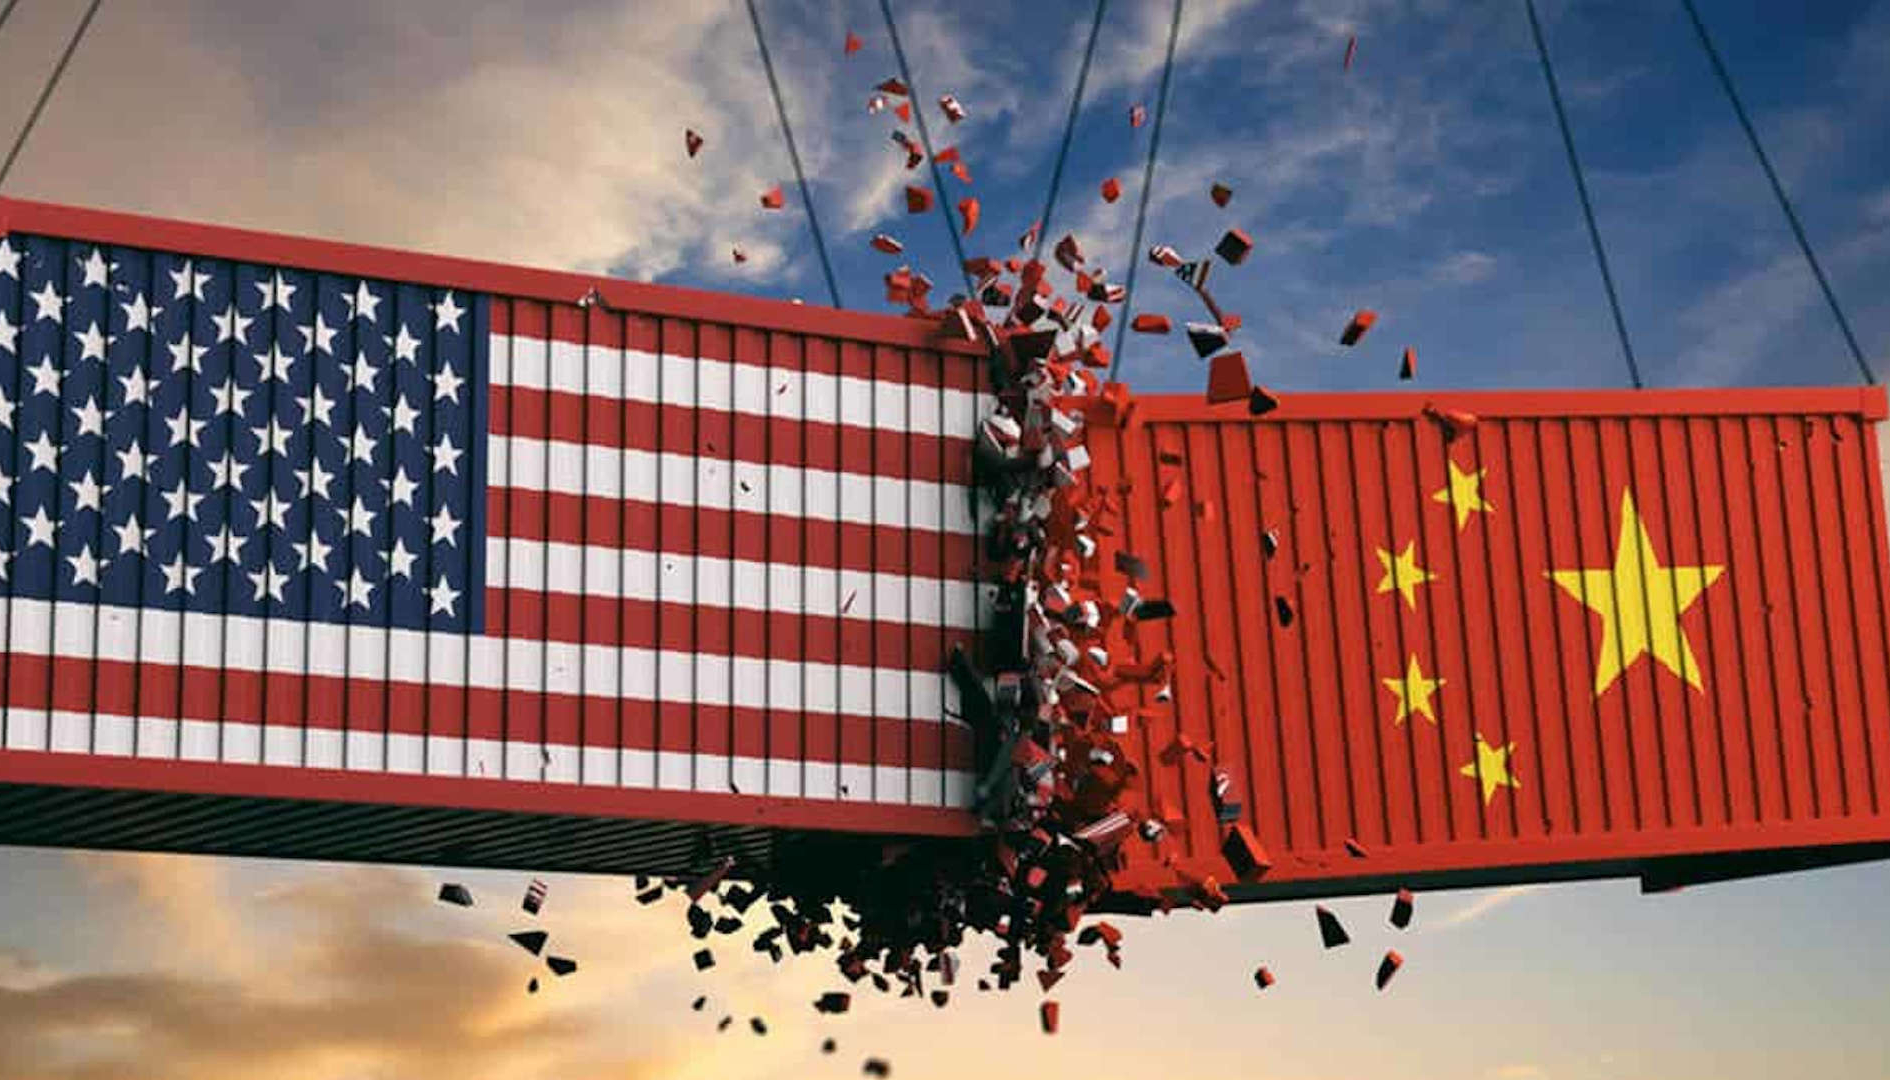 Xiaomi rimossa dalla blacklist USA, c'è speranza per Huawei?